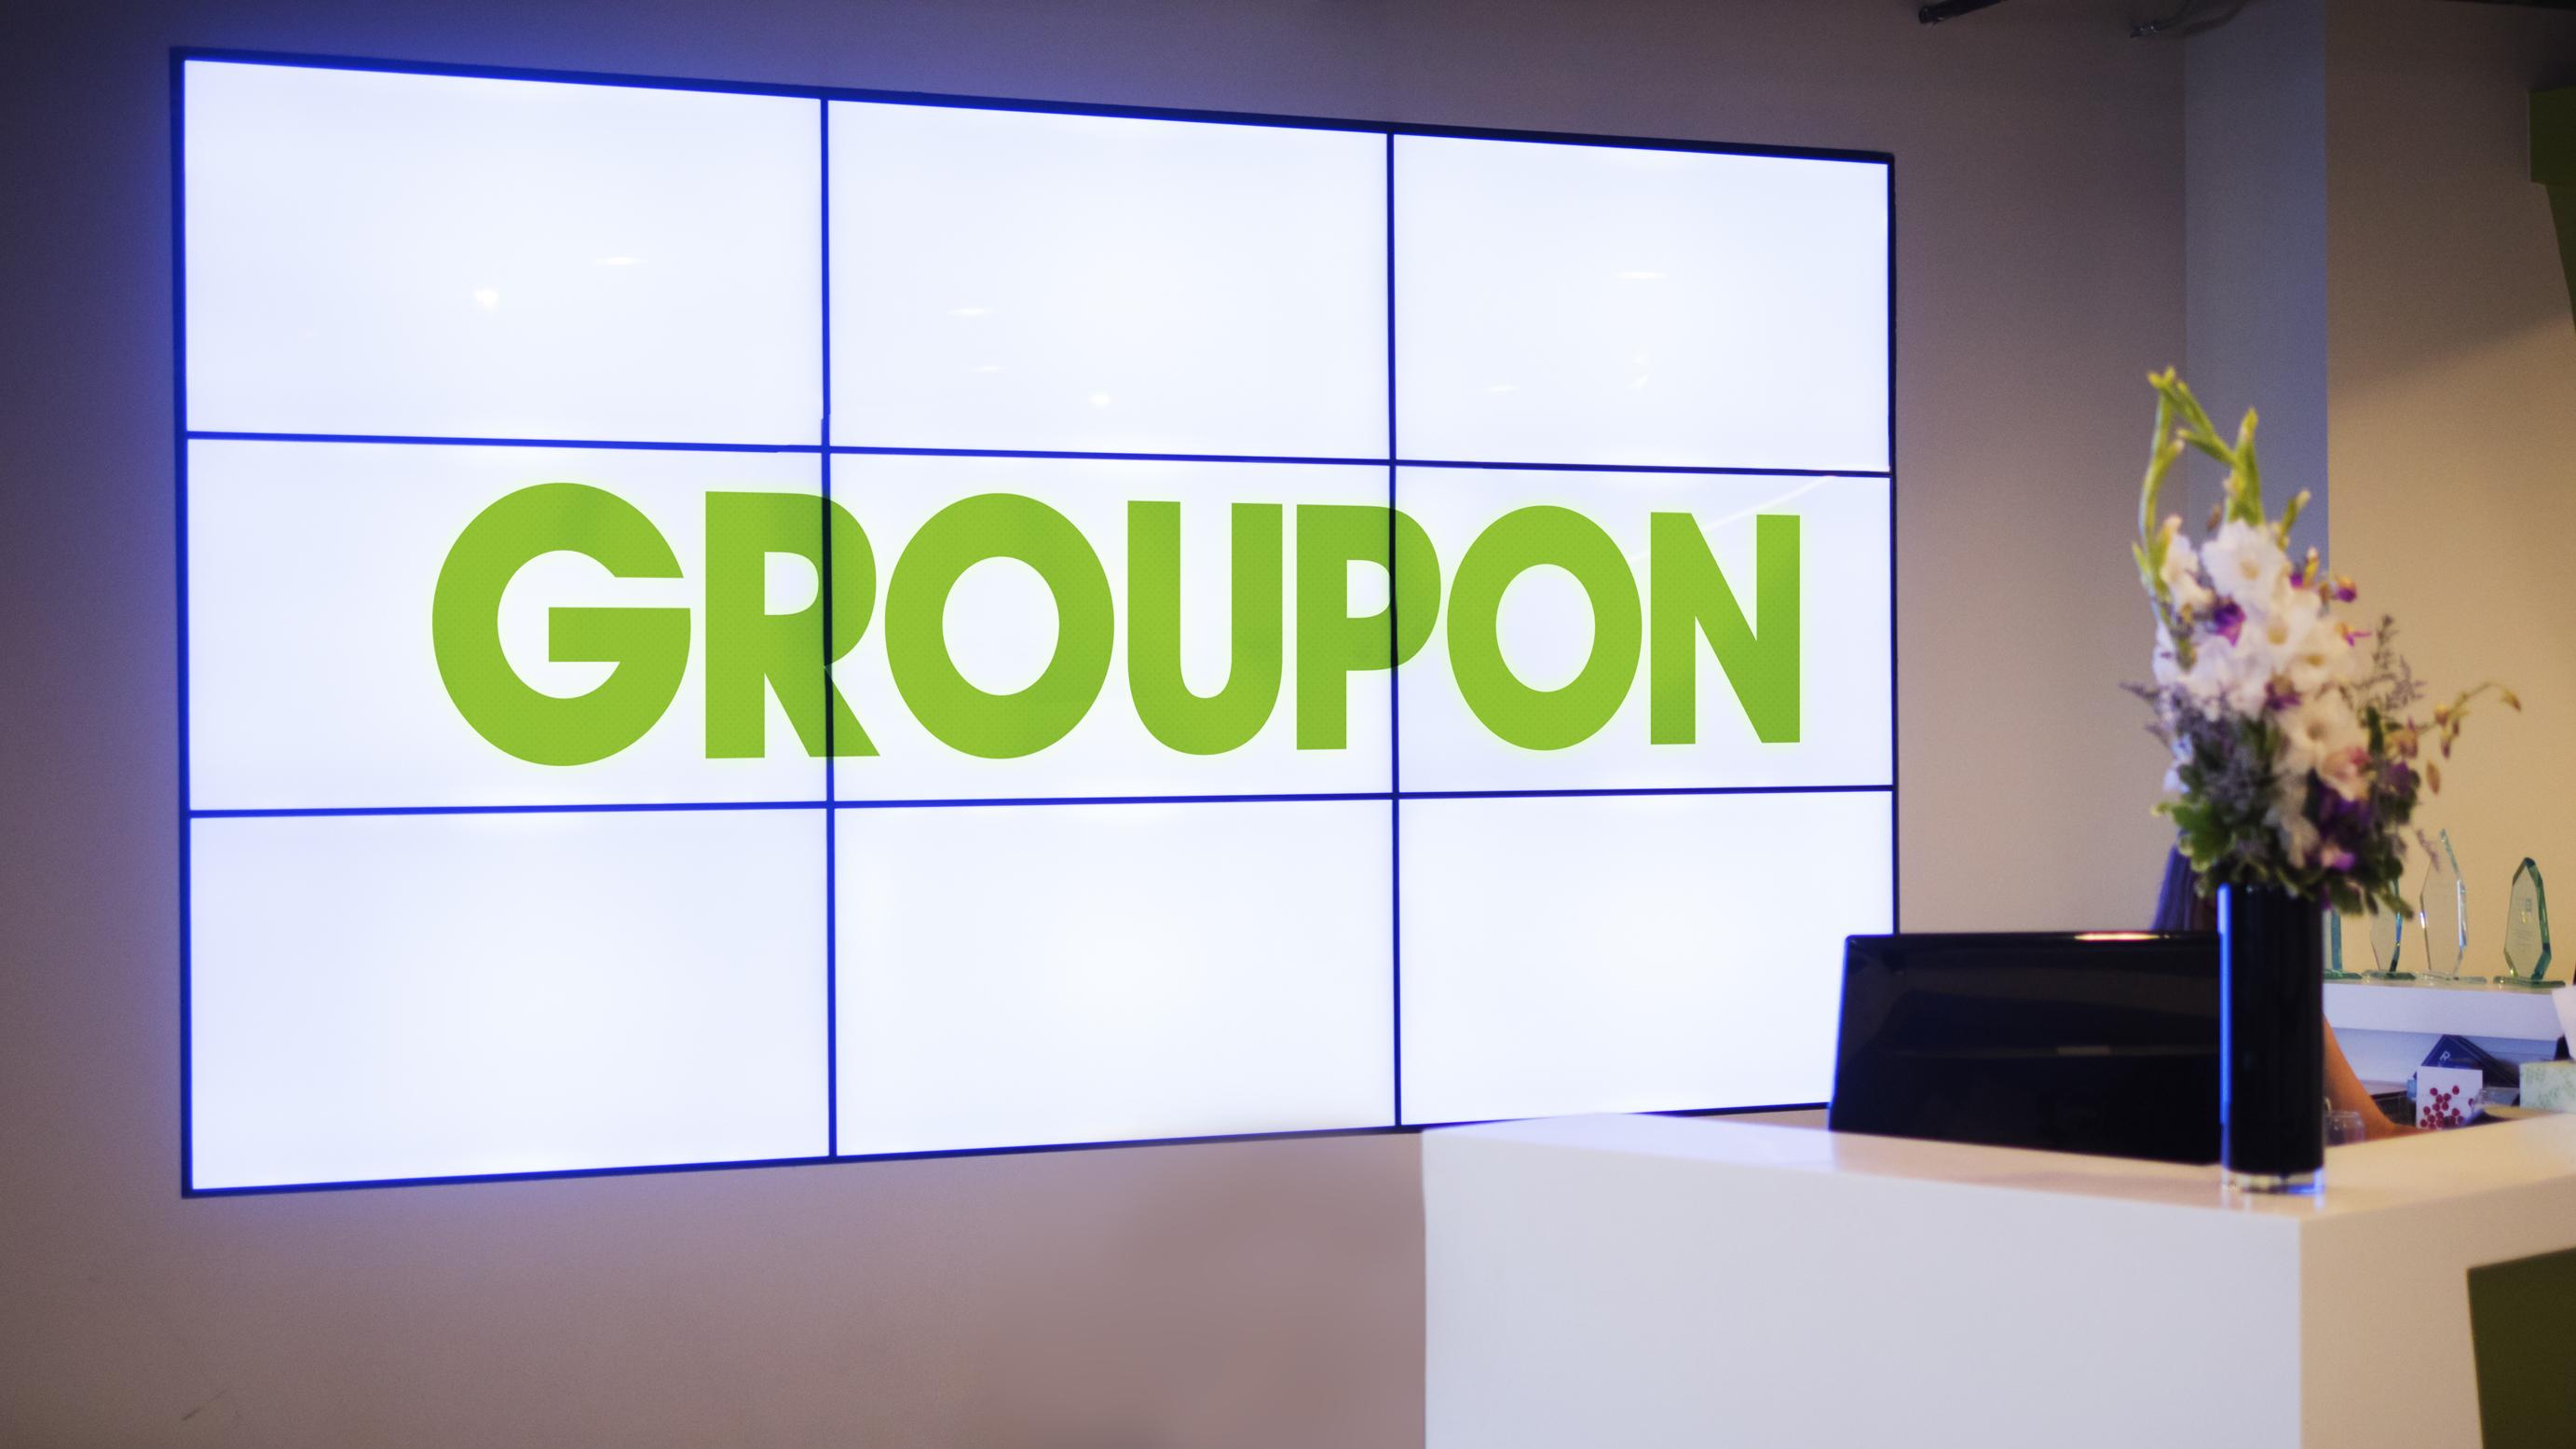 Groupon video wall at its office.